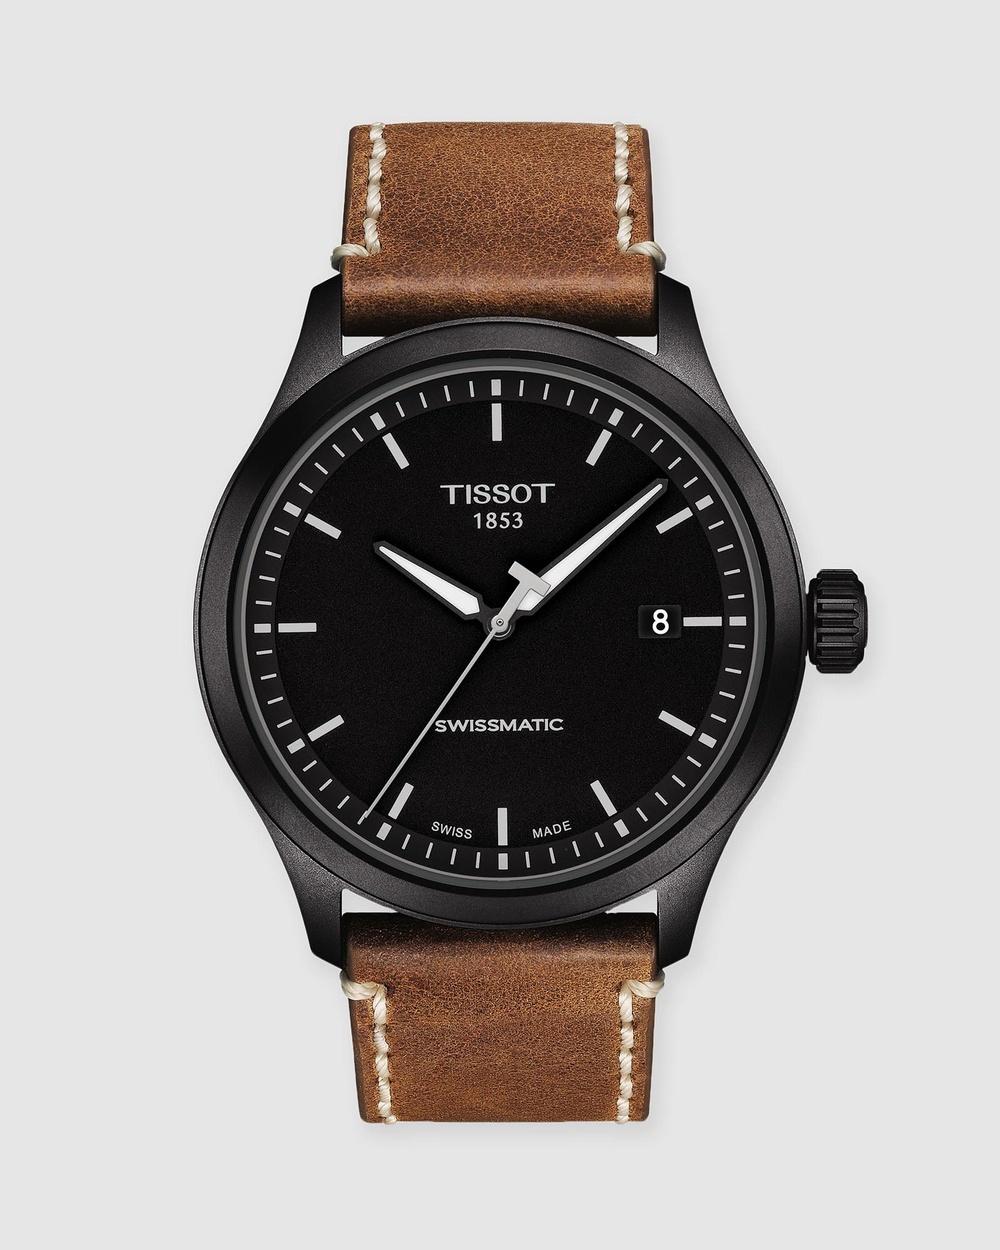 Tissot Gent XL Swissmatic Watches Black & Brown